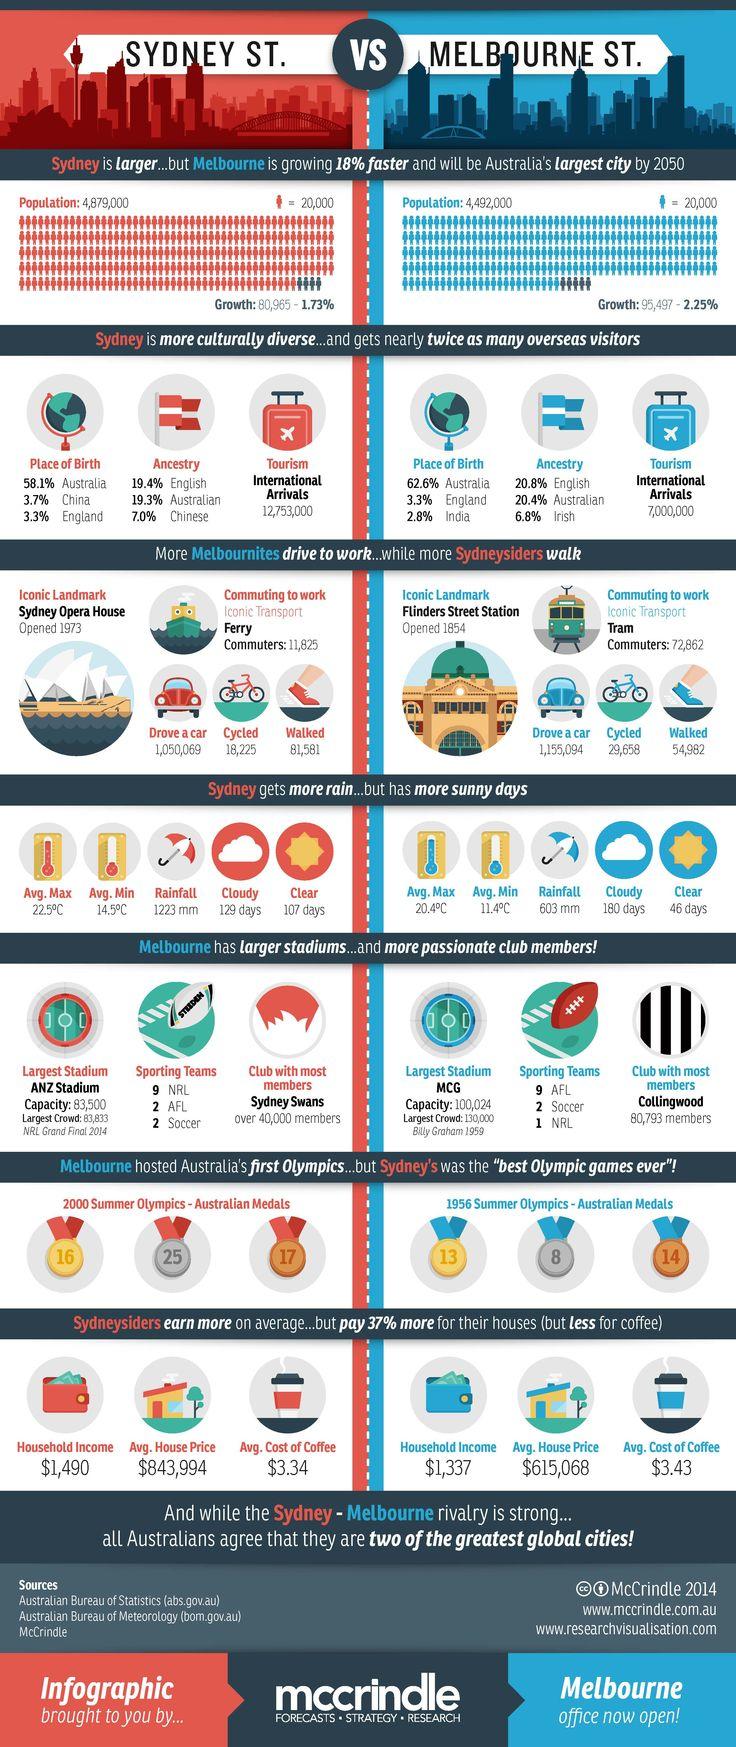 Sydney Vs Melbourne in infographic form.